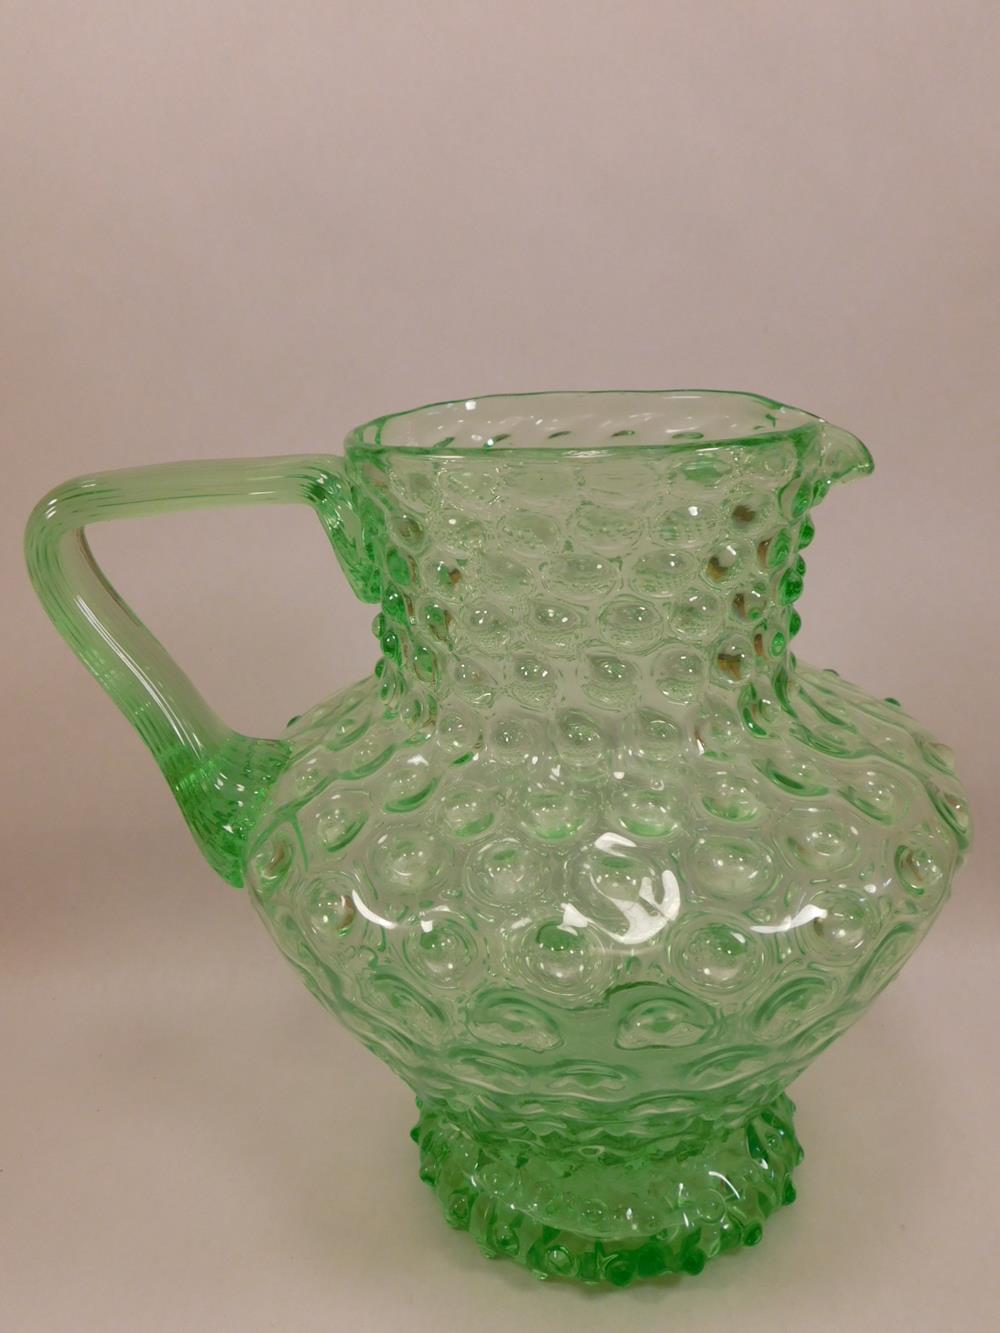 GREEN PITCHER VINTAGE HOBNAIL GLASS